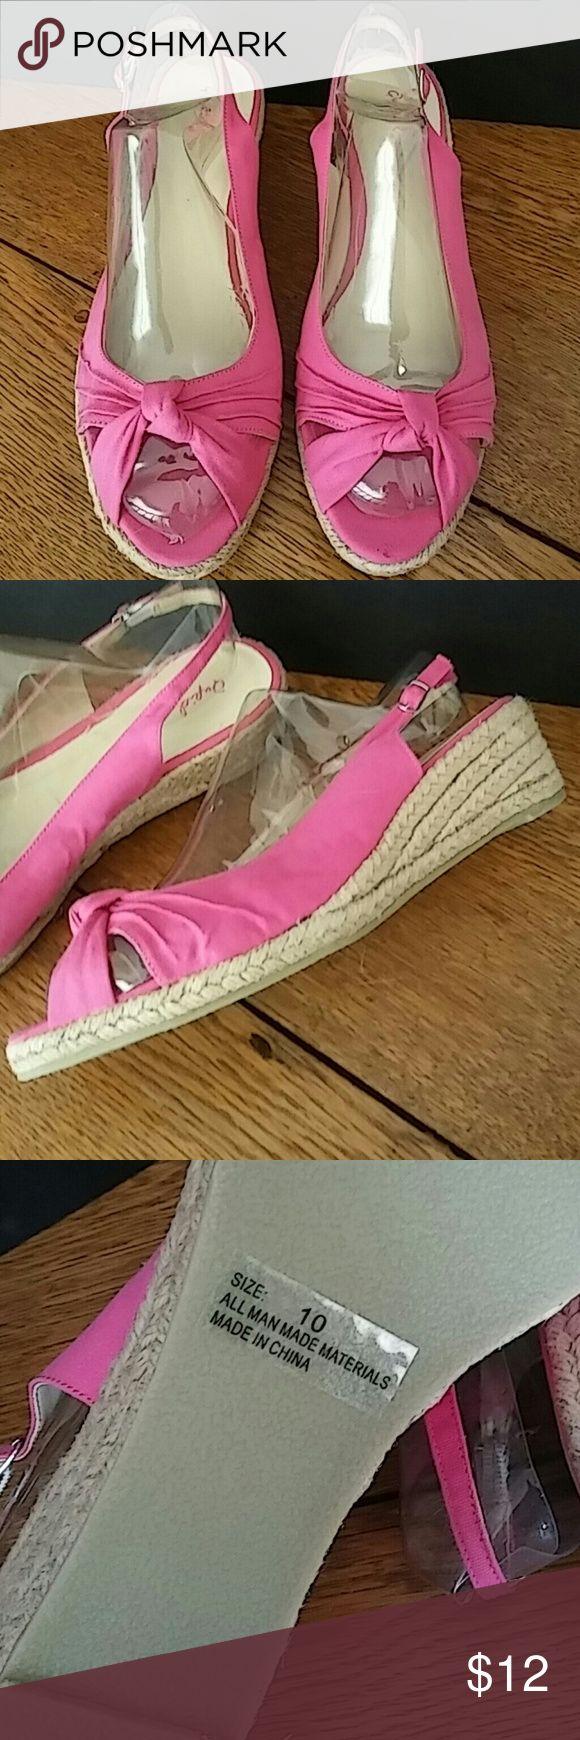 Hot pink sandals Sharp hot pink wedge sandal. Open toe. Never worn! Qupid Shoes Sandals